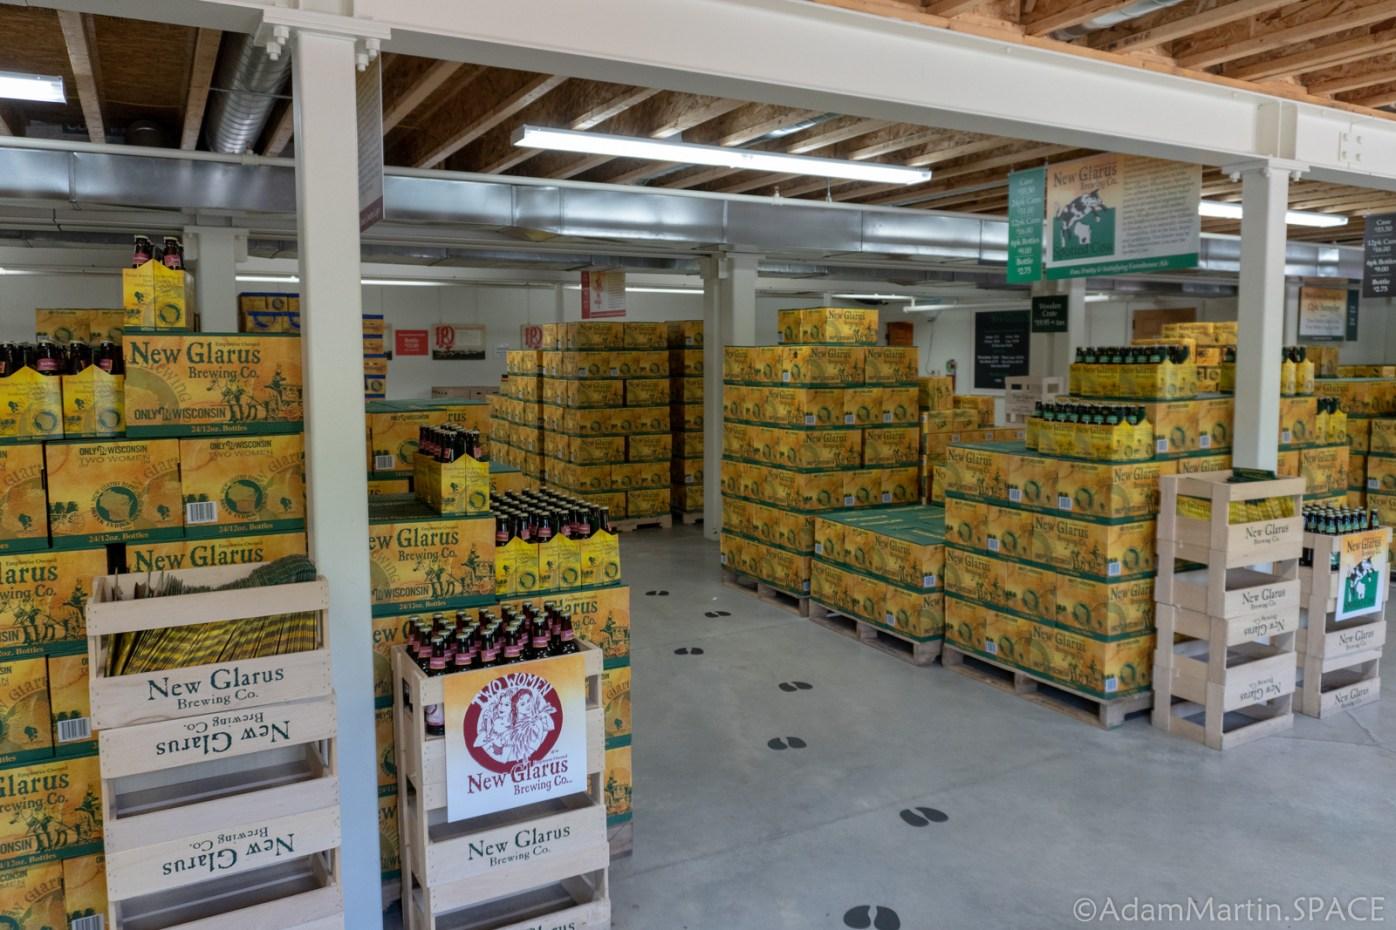 New Glarus Brewery - Beer Store